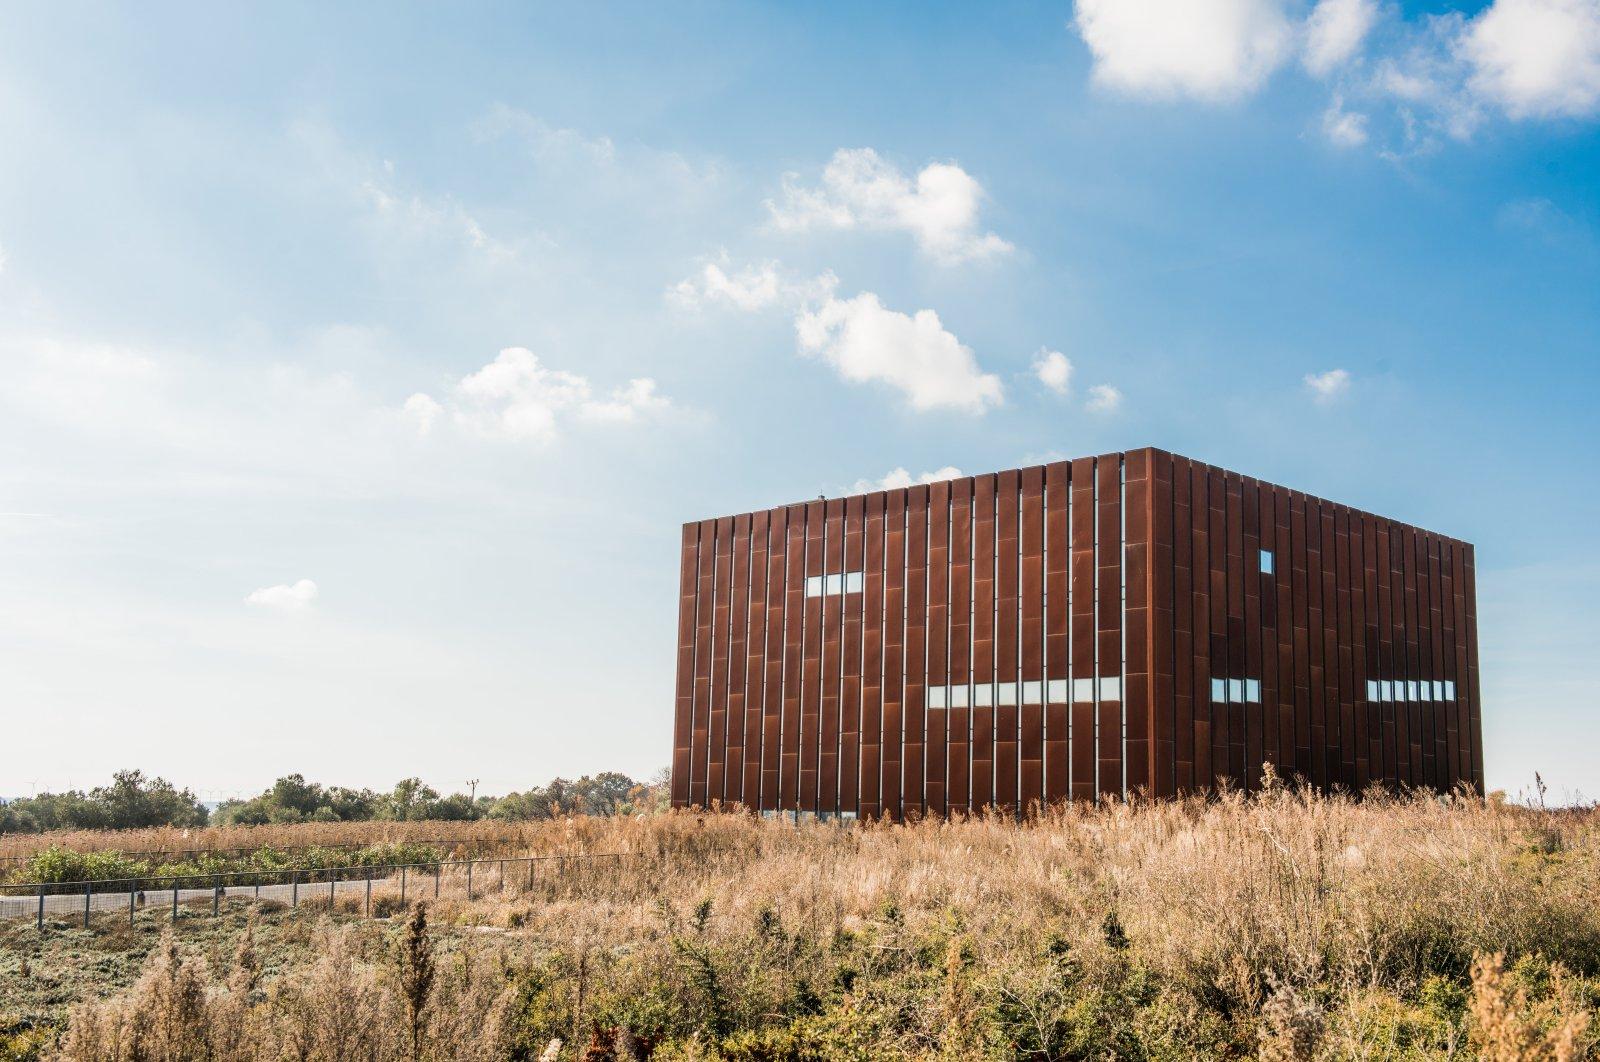 The exterior of the Troy Museum, Çanakkale, northwestern Turkey, Dec. 18, 2019. (Photo by Murat Şengül)